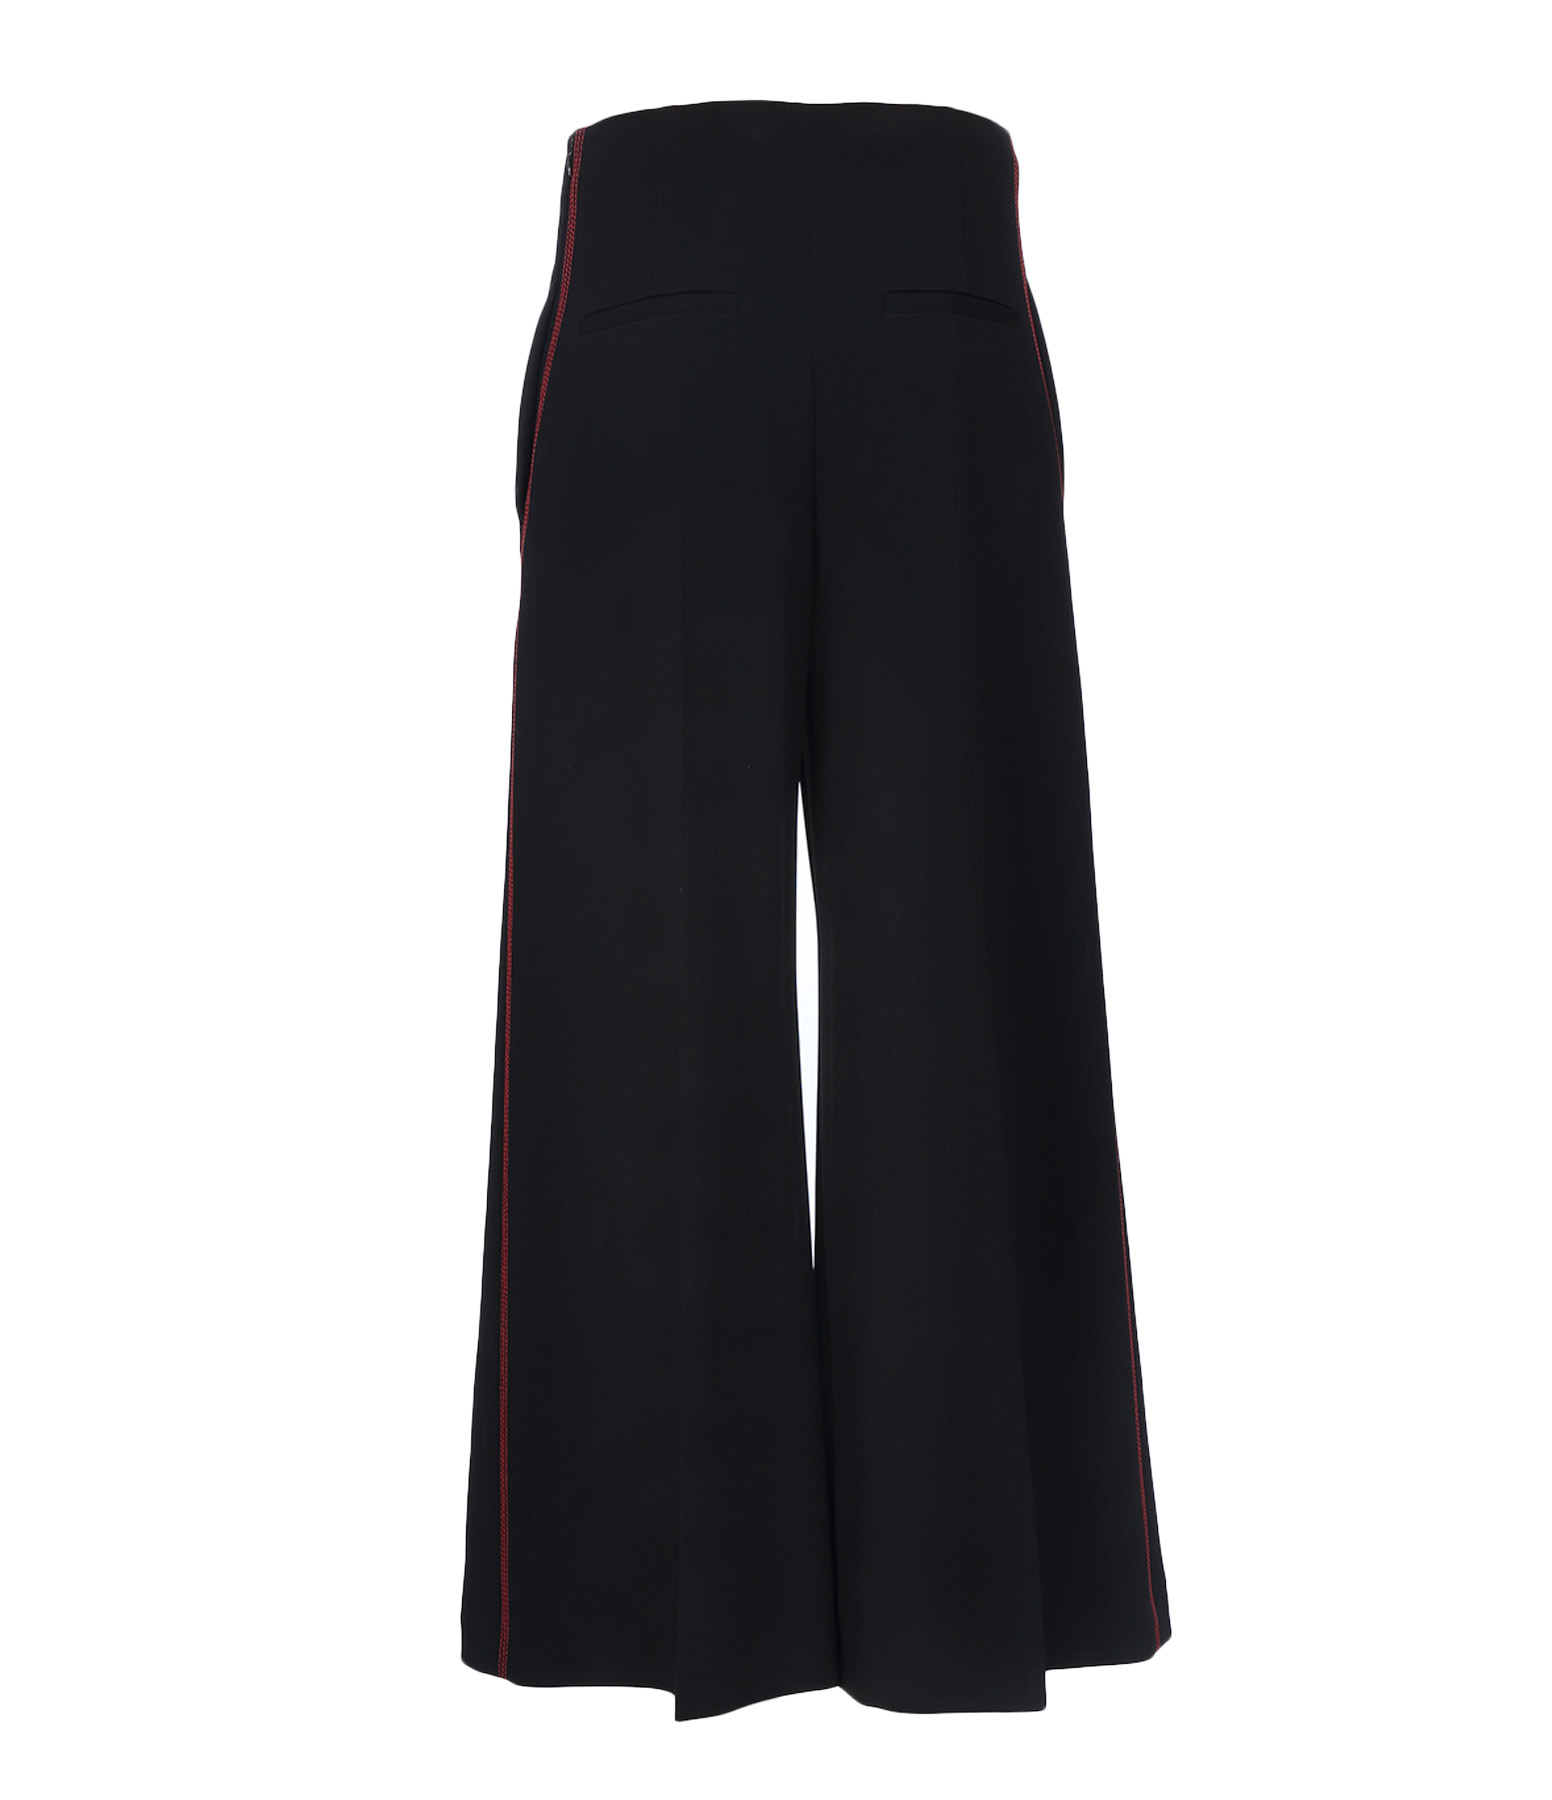 Pantalon Brad New Viscose Noir